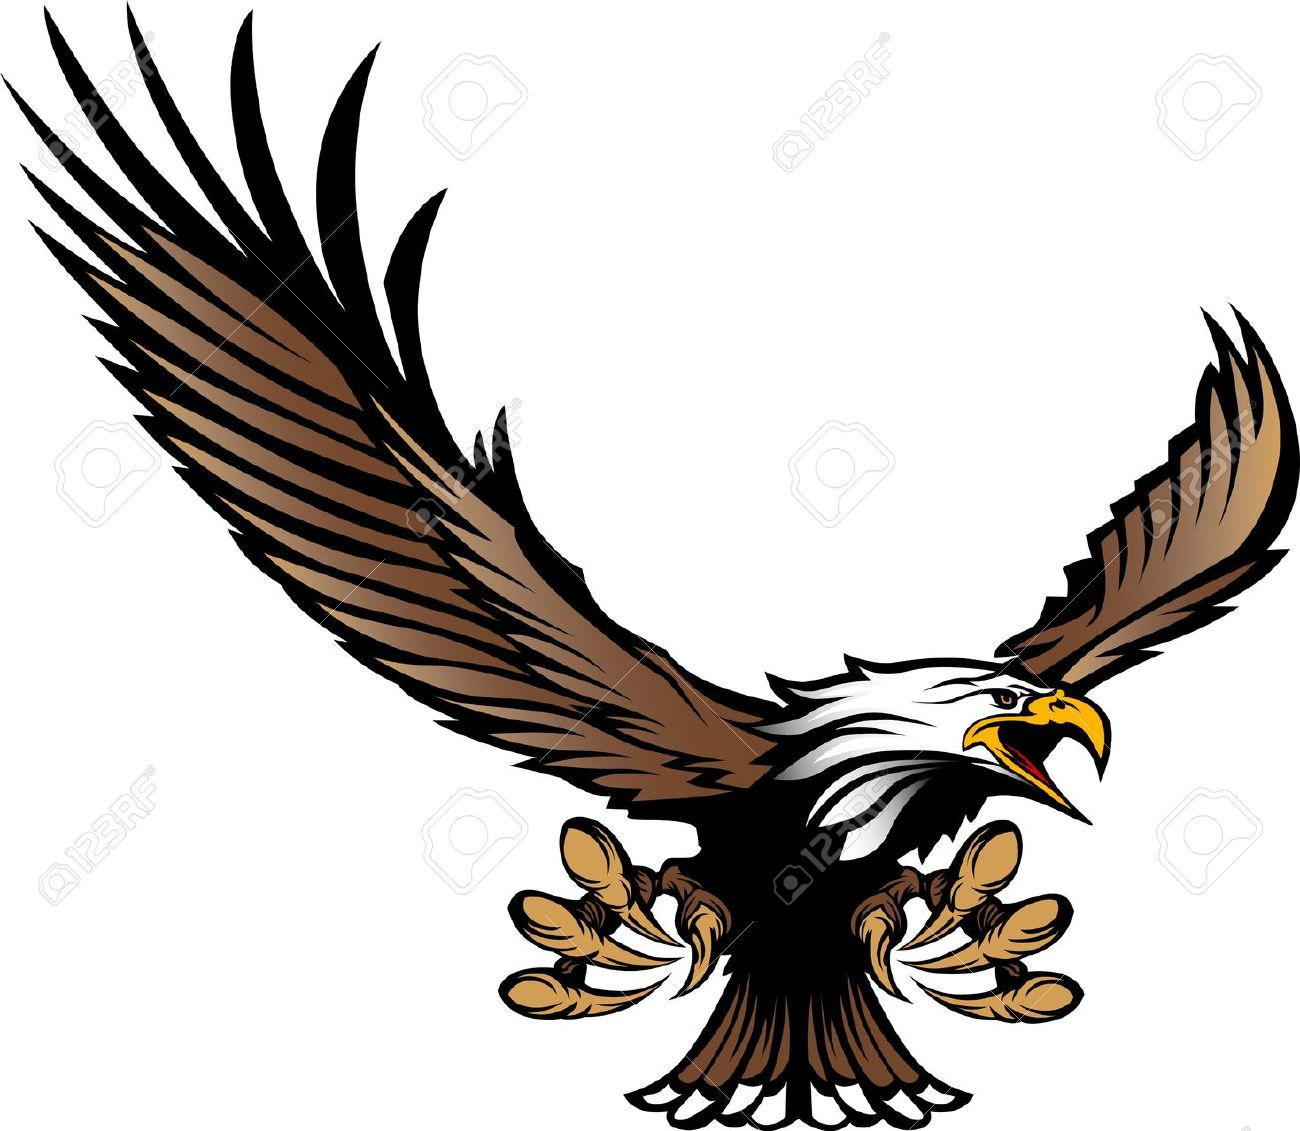 Hawk clipart #17, Download drawings